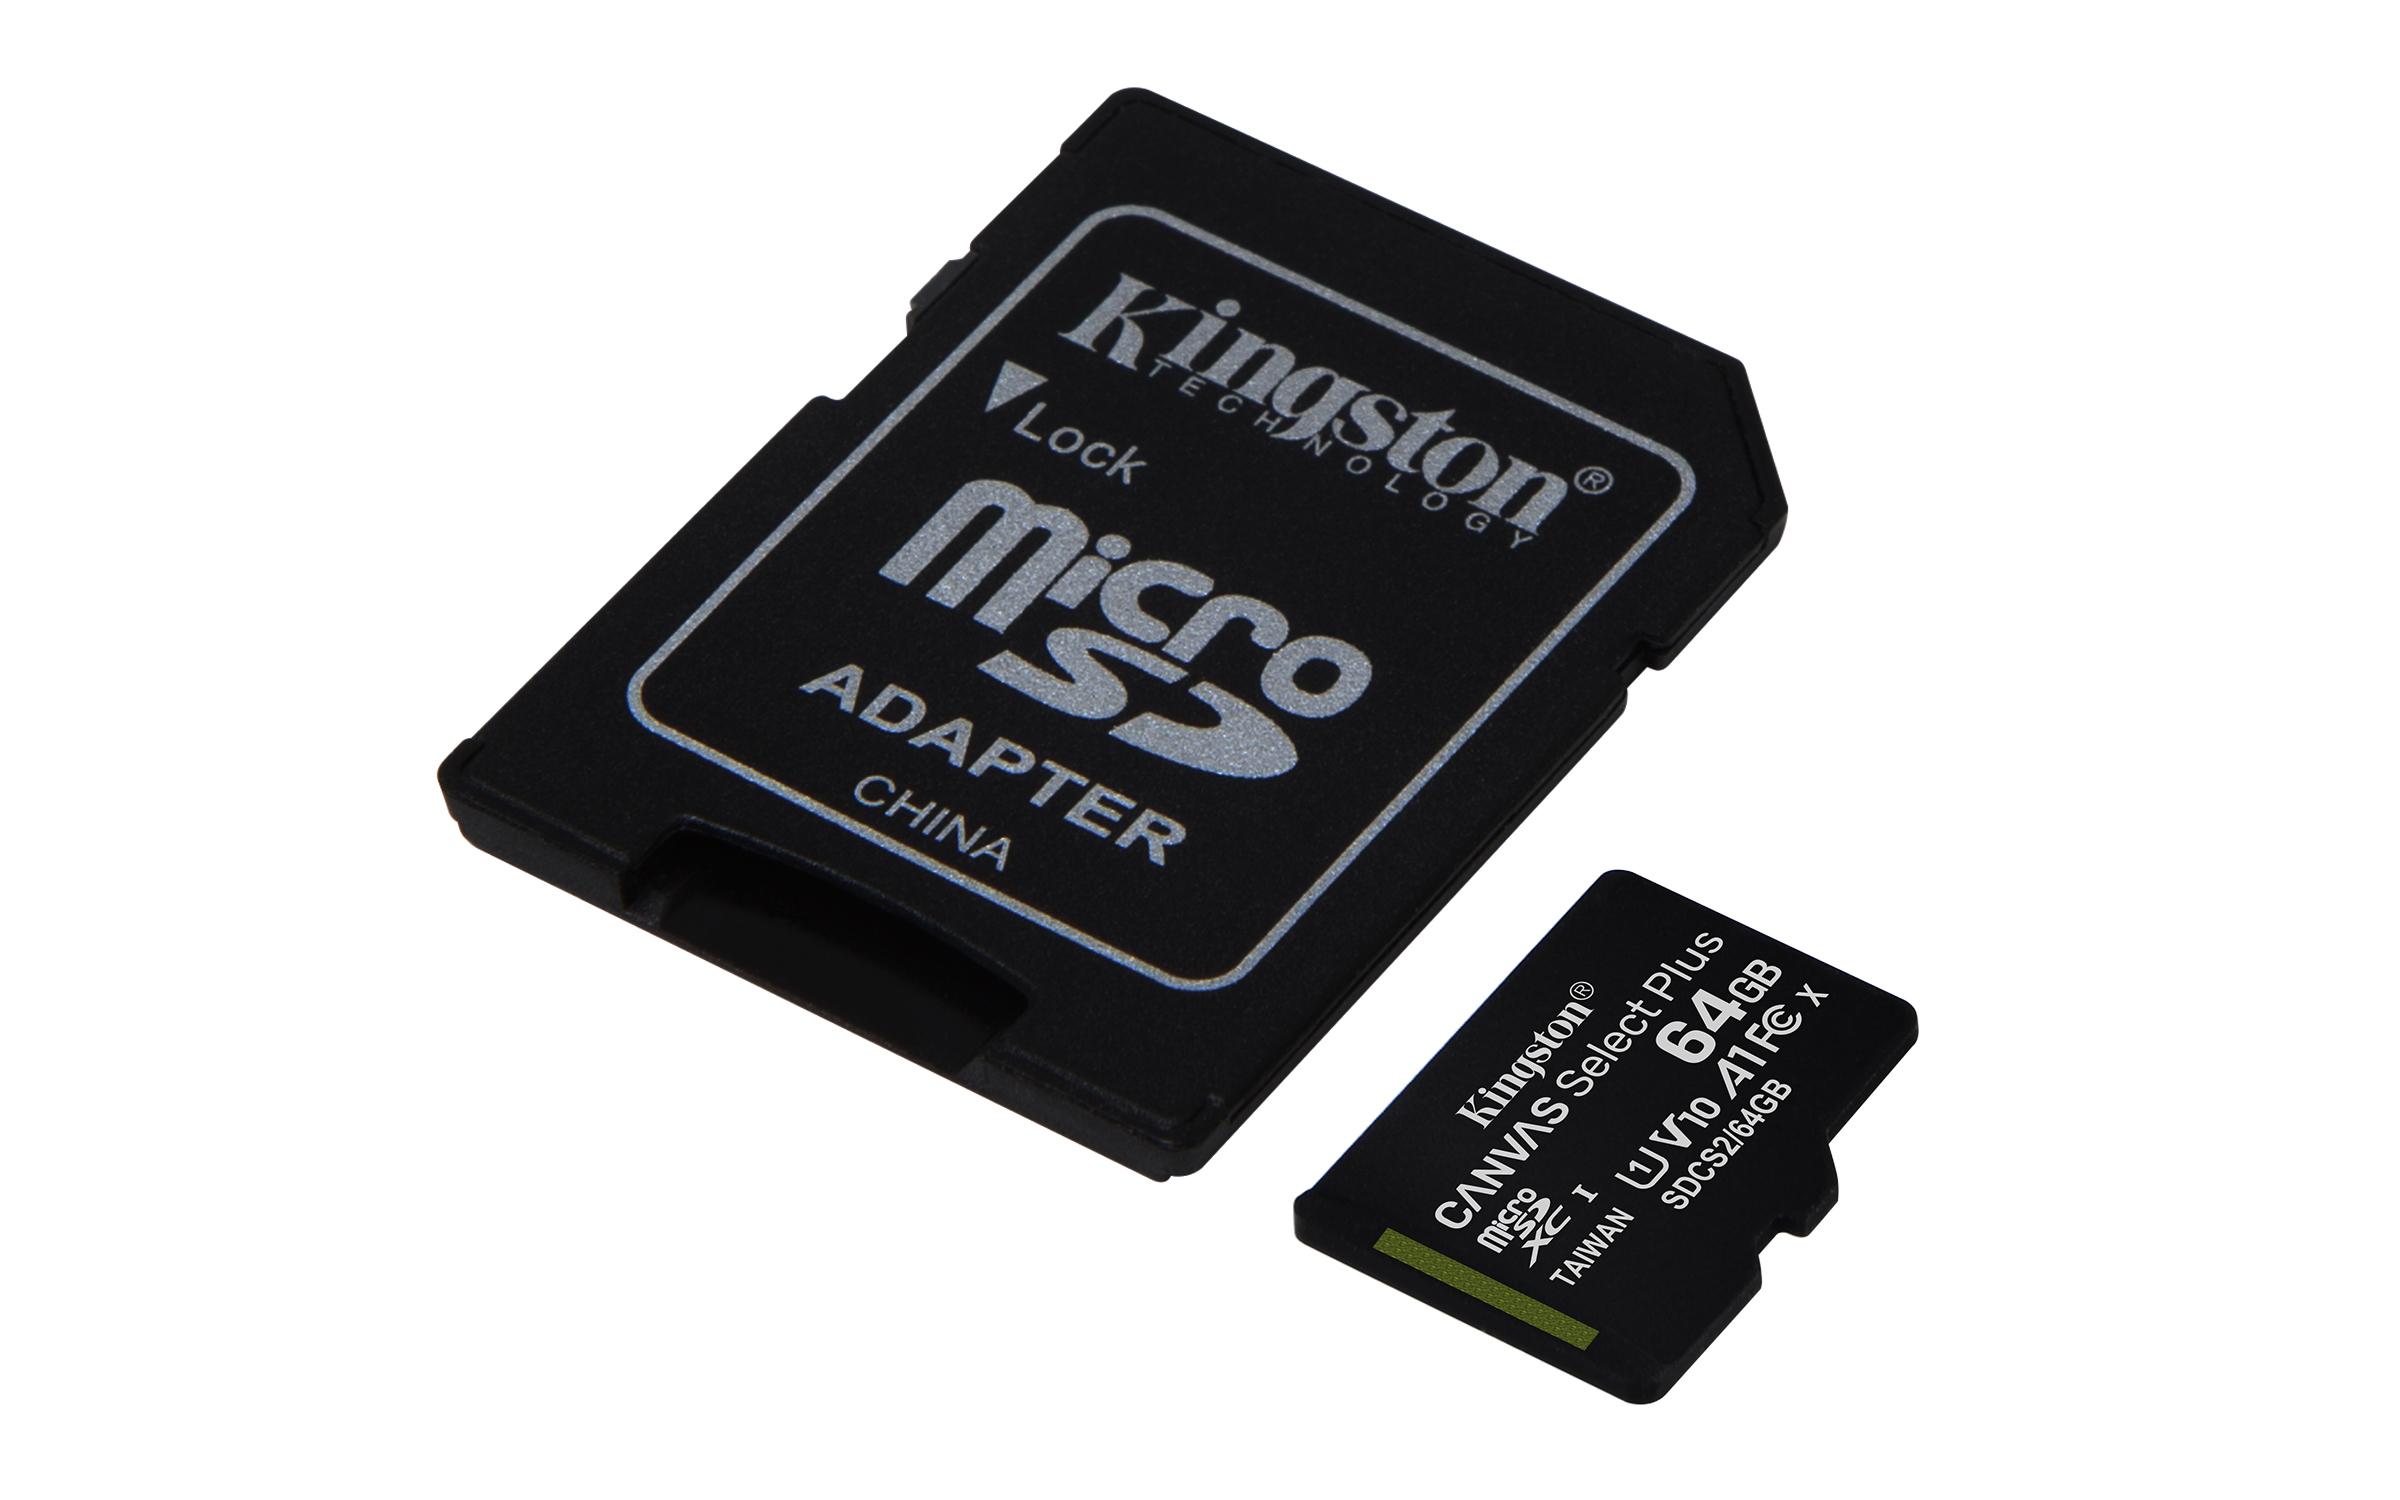 SDCS2/64GB-3P1A microSD 64 GB (100 MB/s, 3-pack)